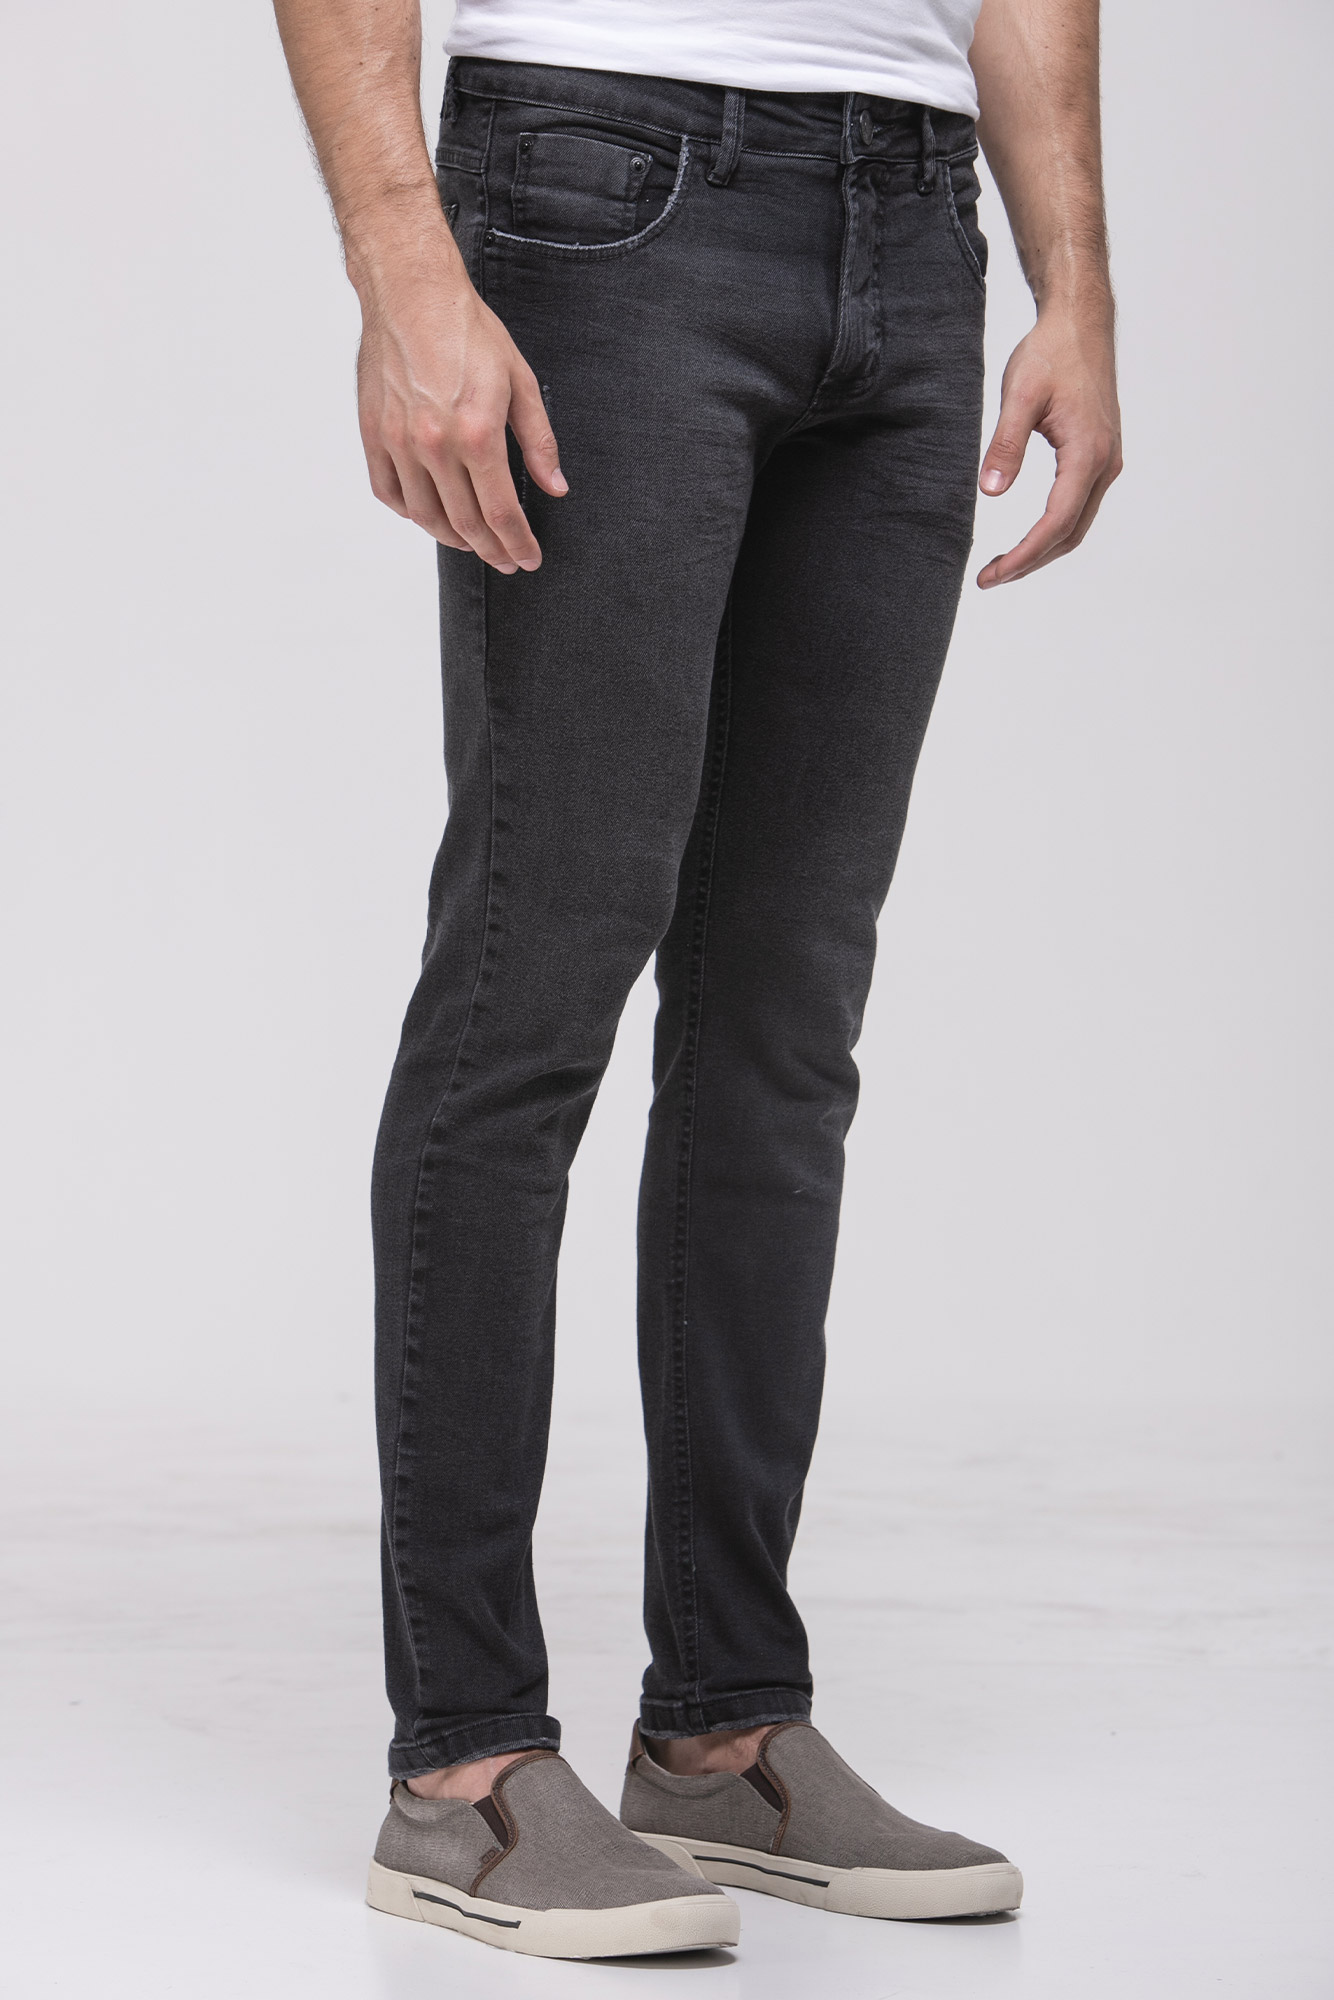 Calça Jeans Soft Black